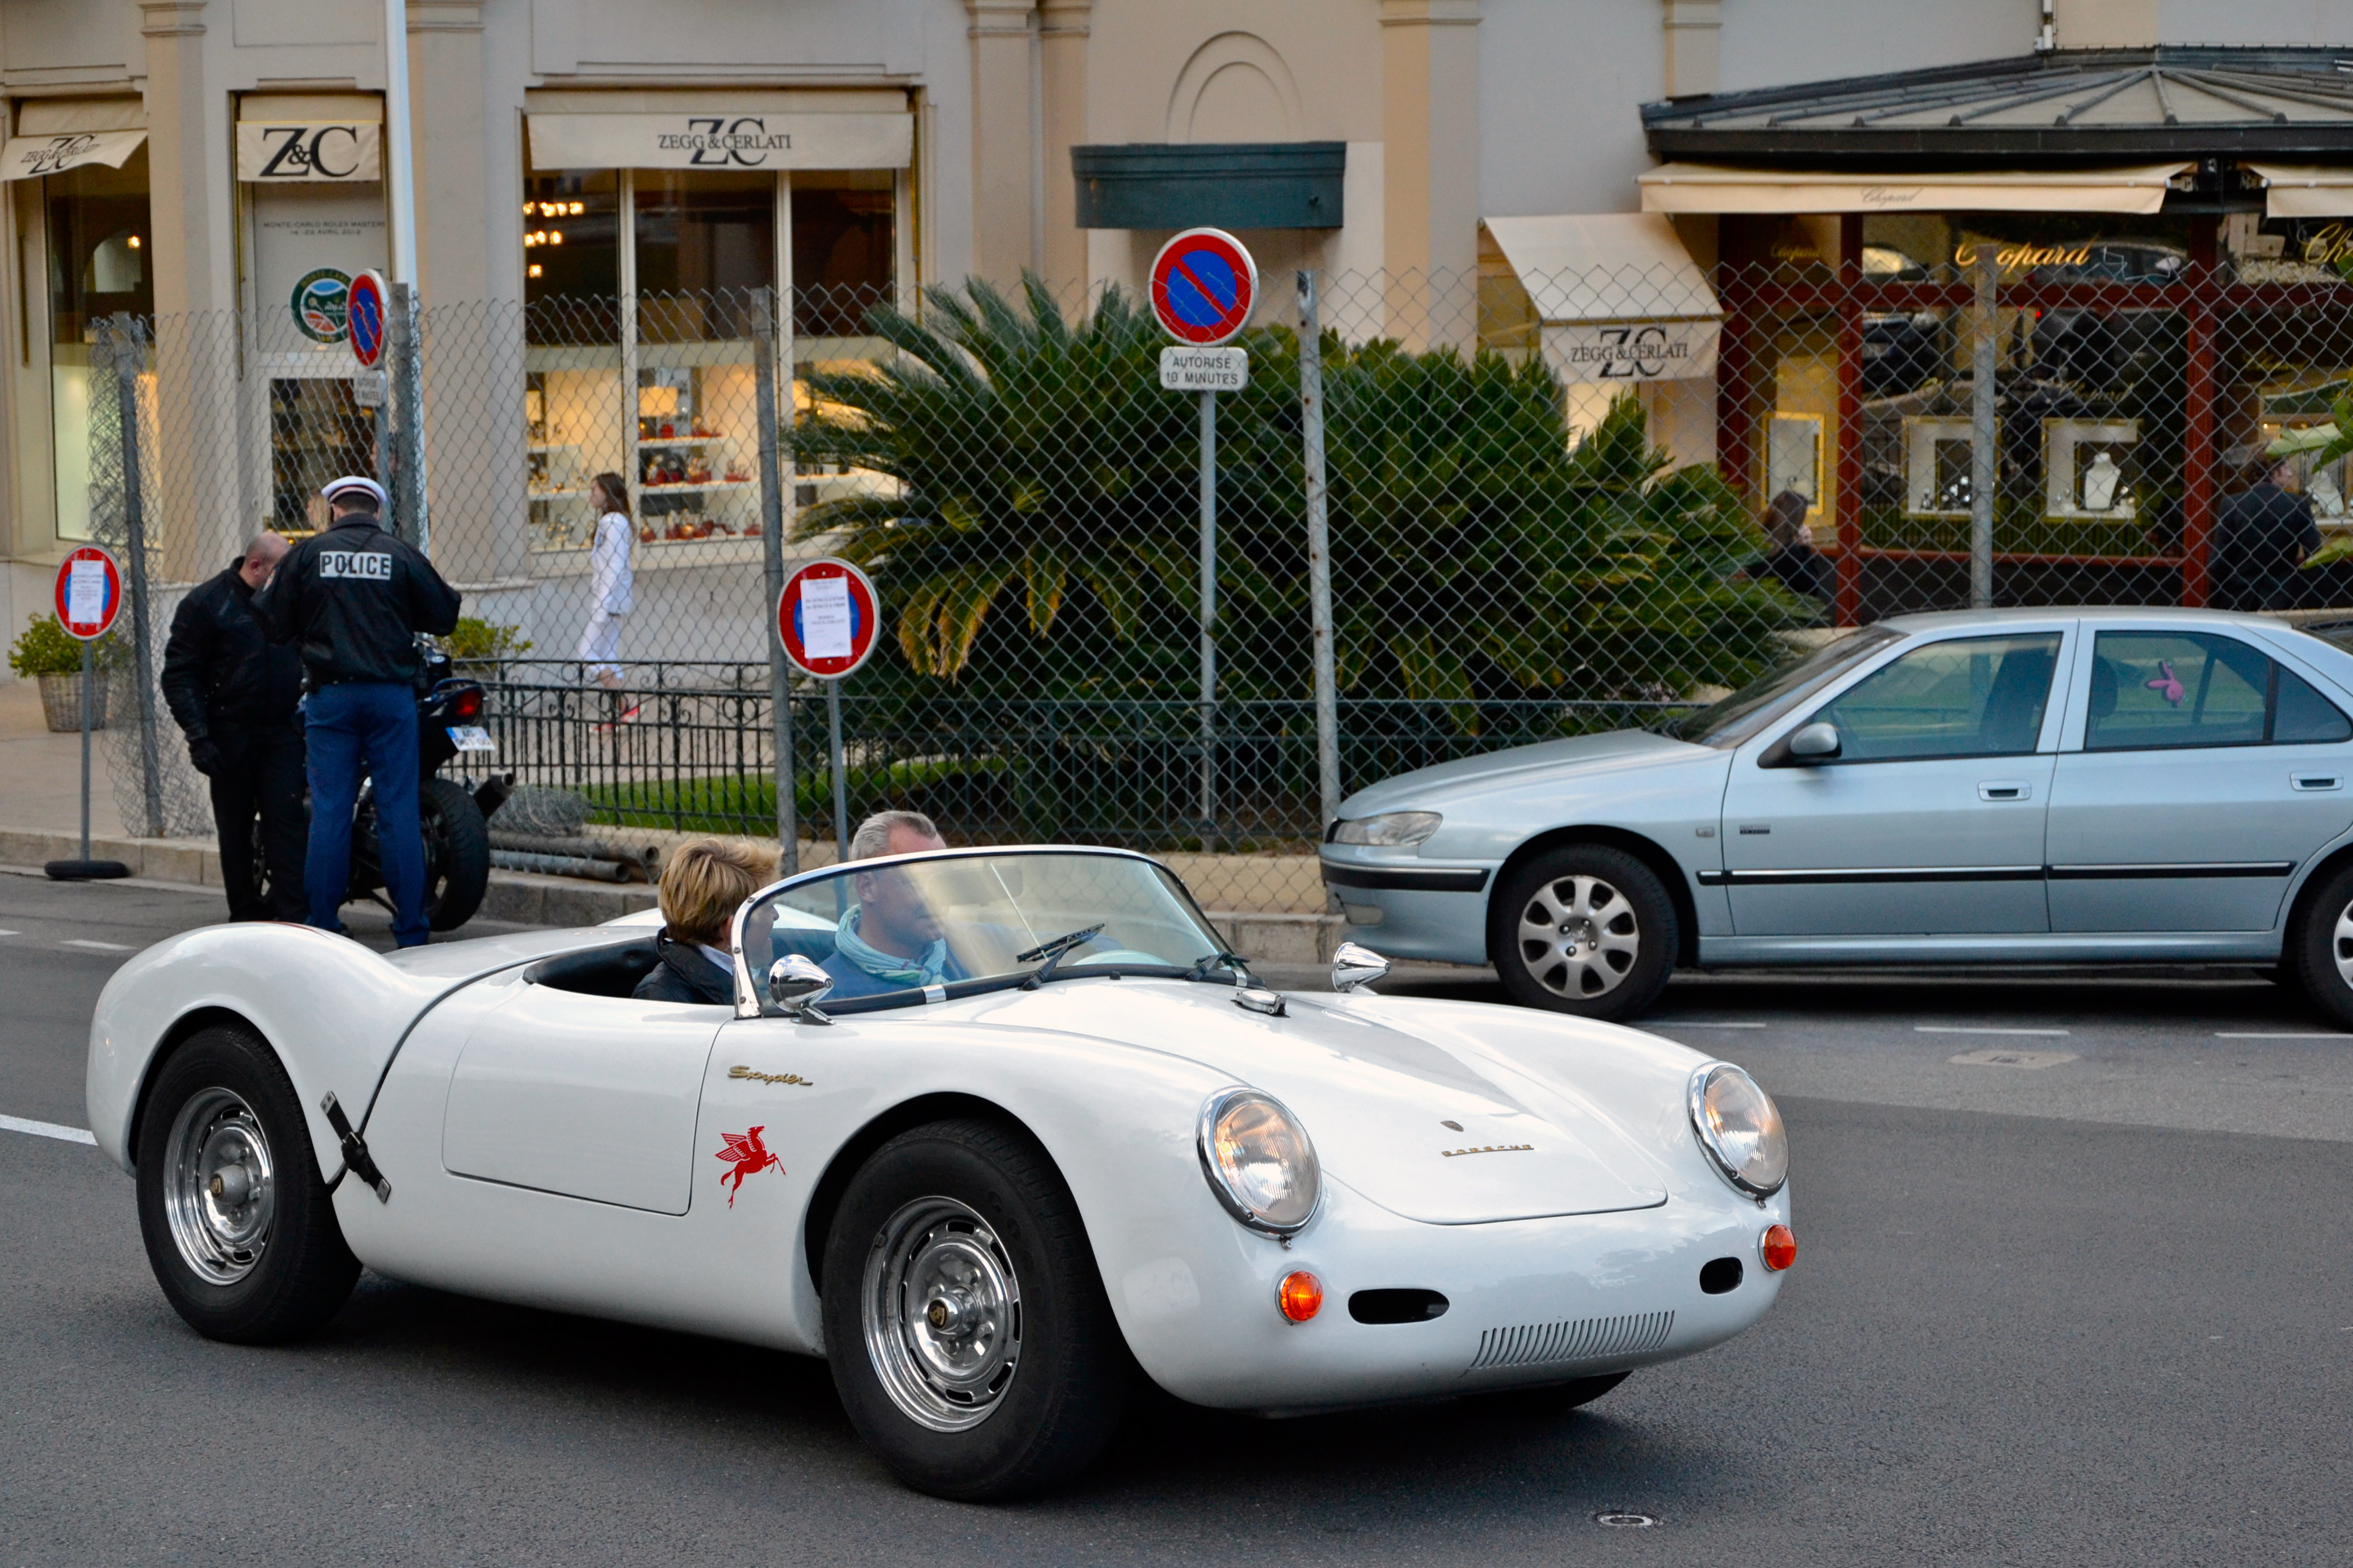 fileporsche 550 spyder 7108960967jpg - Porsche Spyder 550